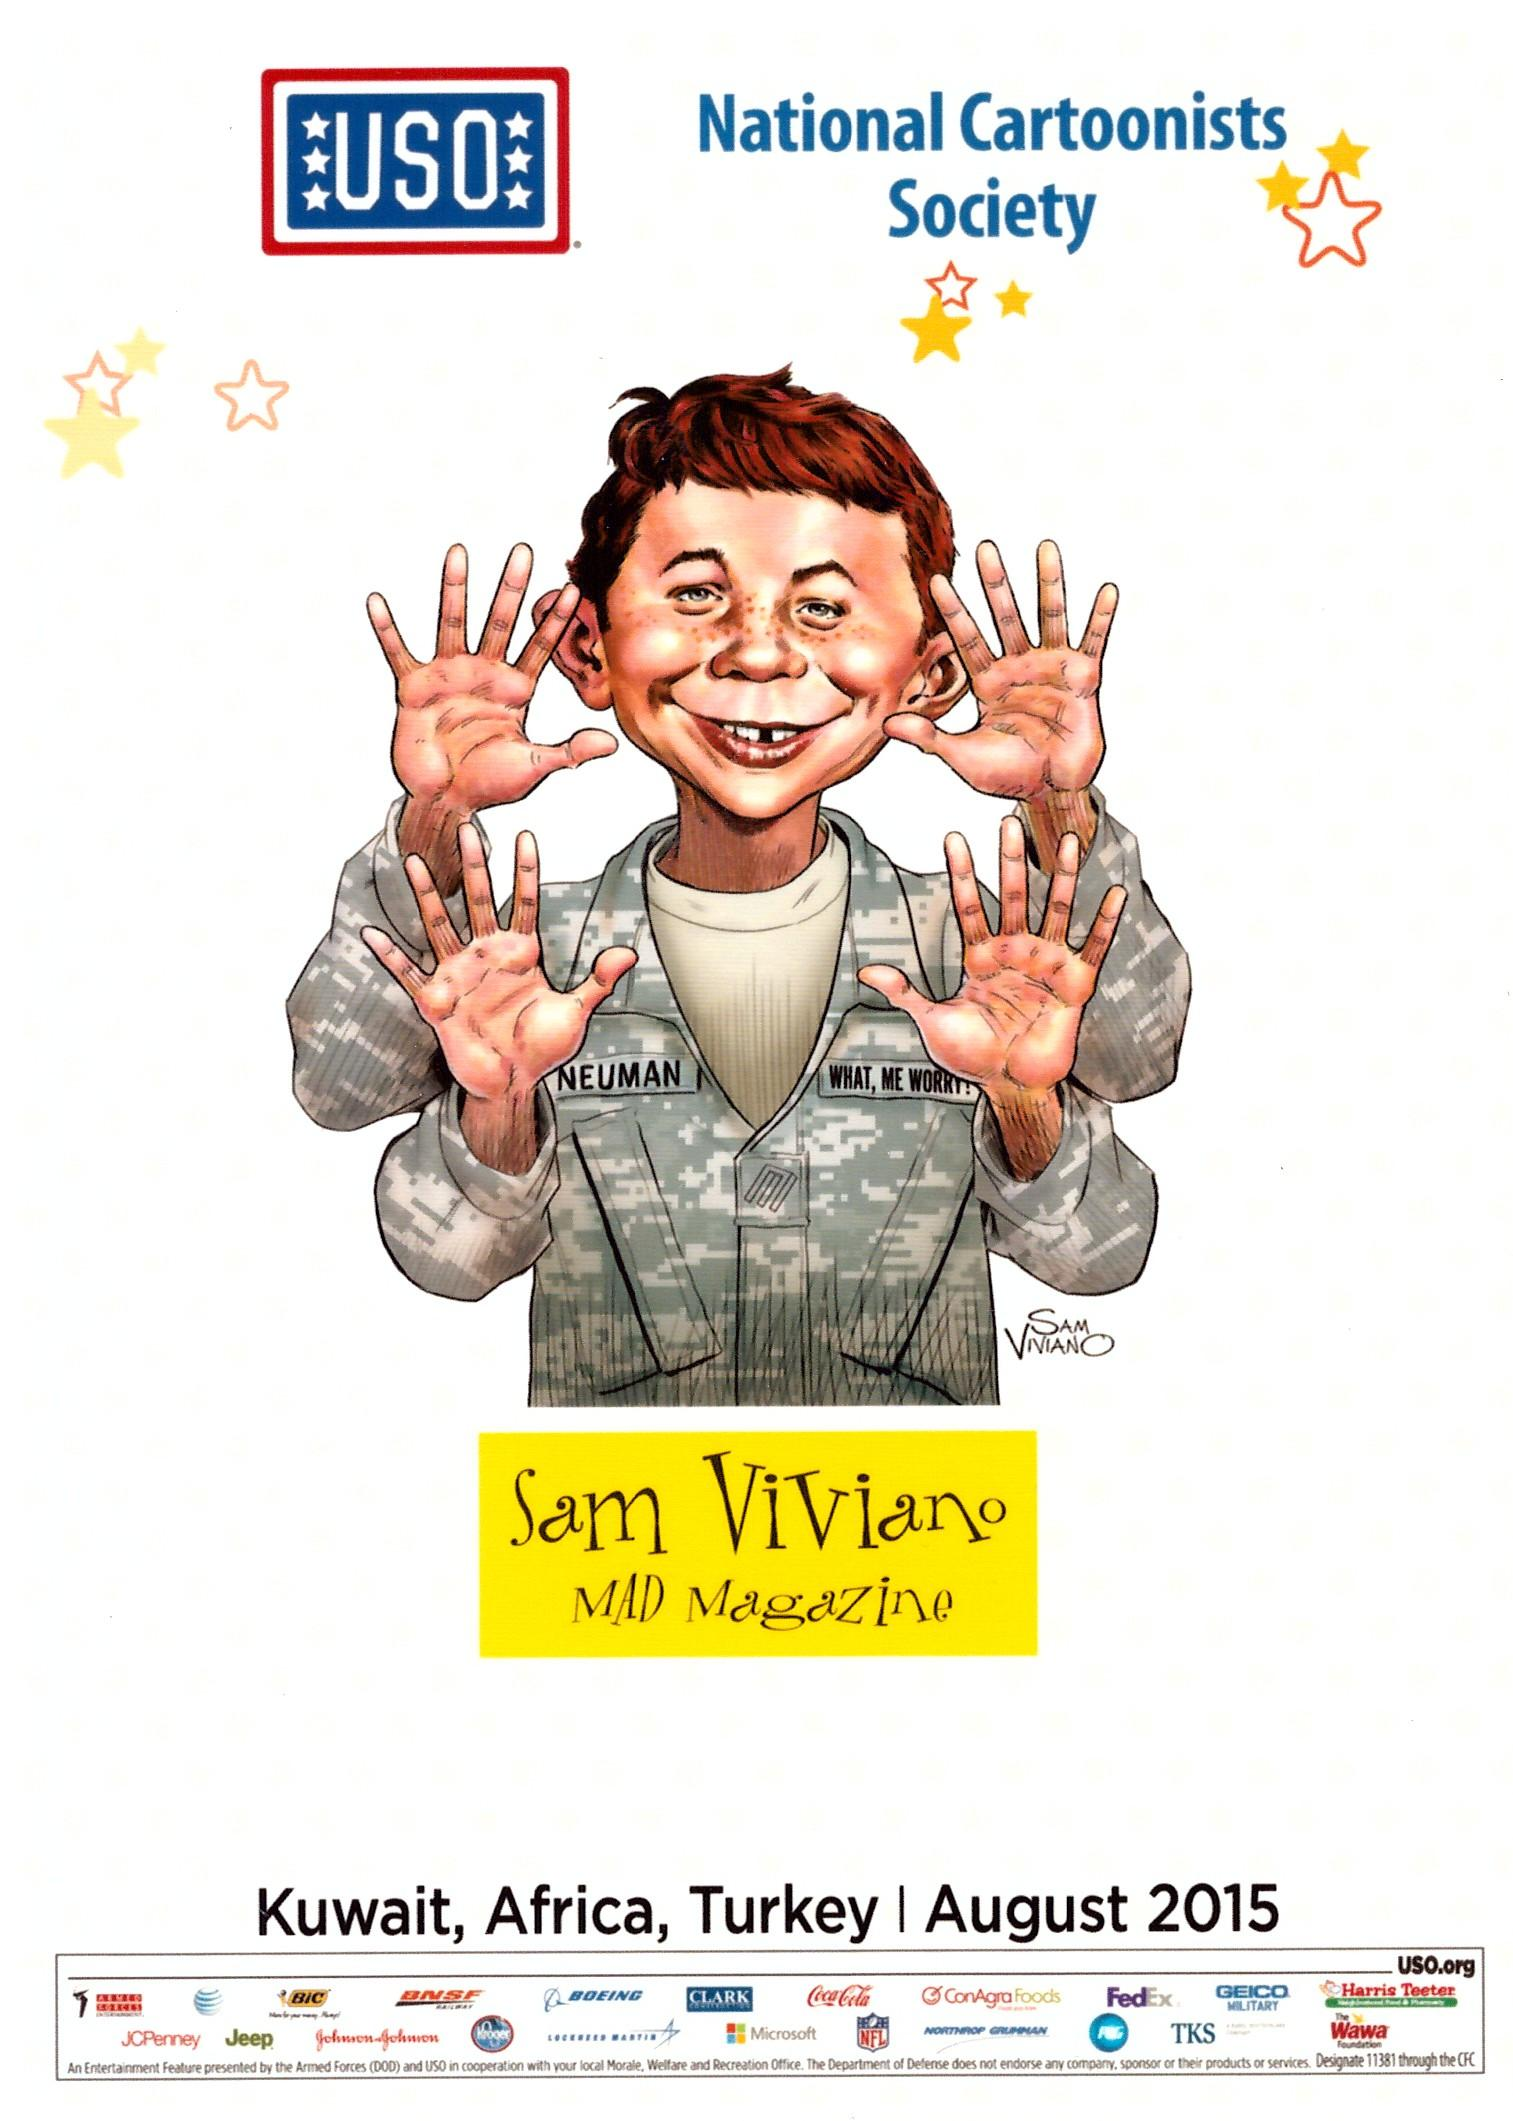 National Cartoonists Society Sam Viviano Promotional Card • USA